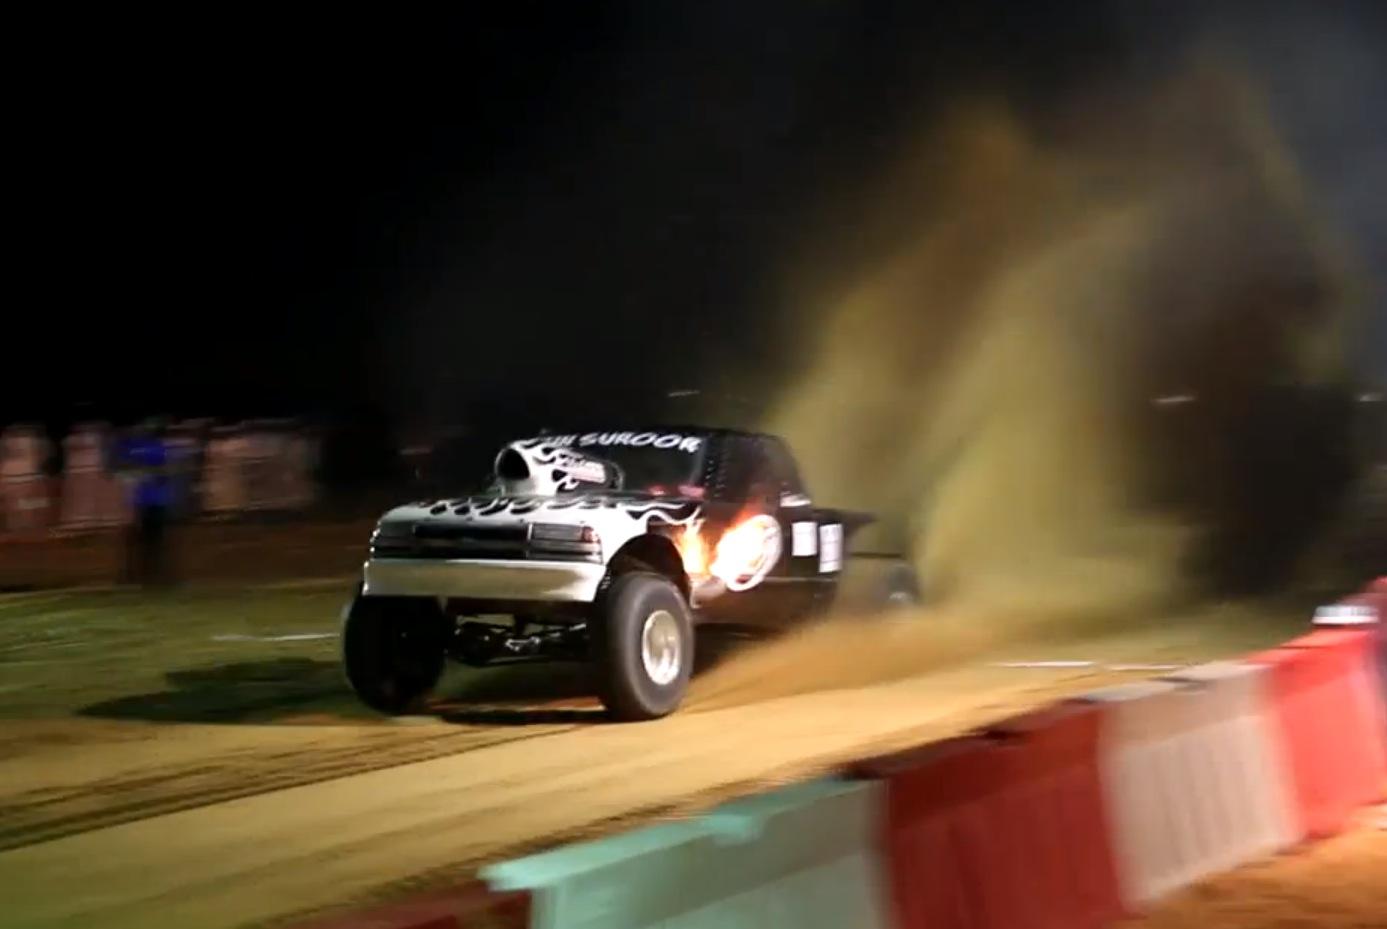 Sand Drag Racing in UAE Looks Extreme - autoevolution